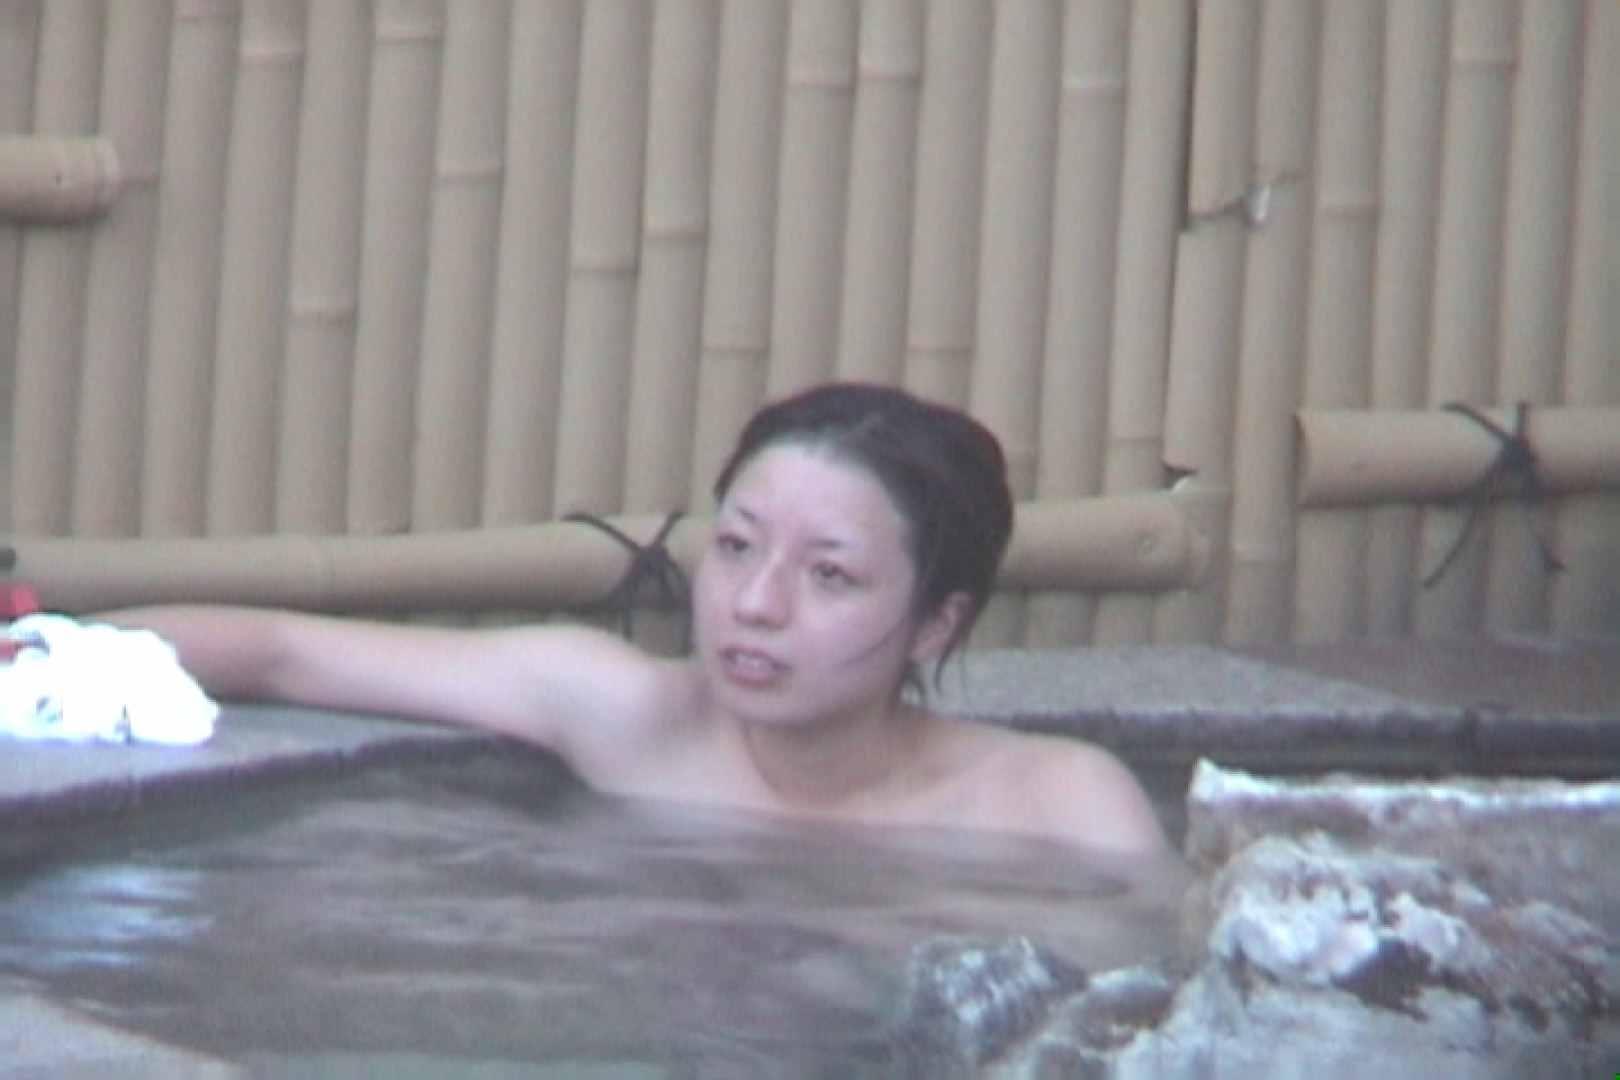 Aquaな露天風呂Vol.608 HなOL | 盗撮  89pic 43